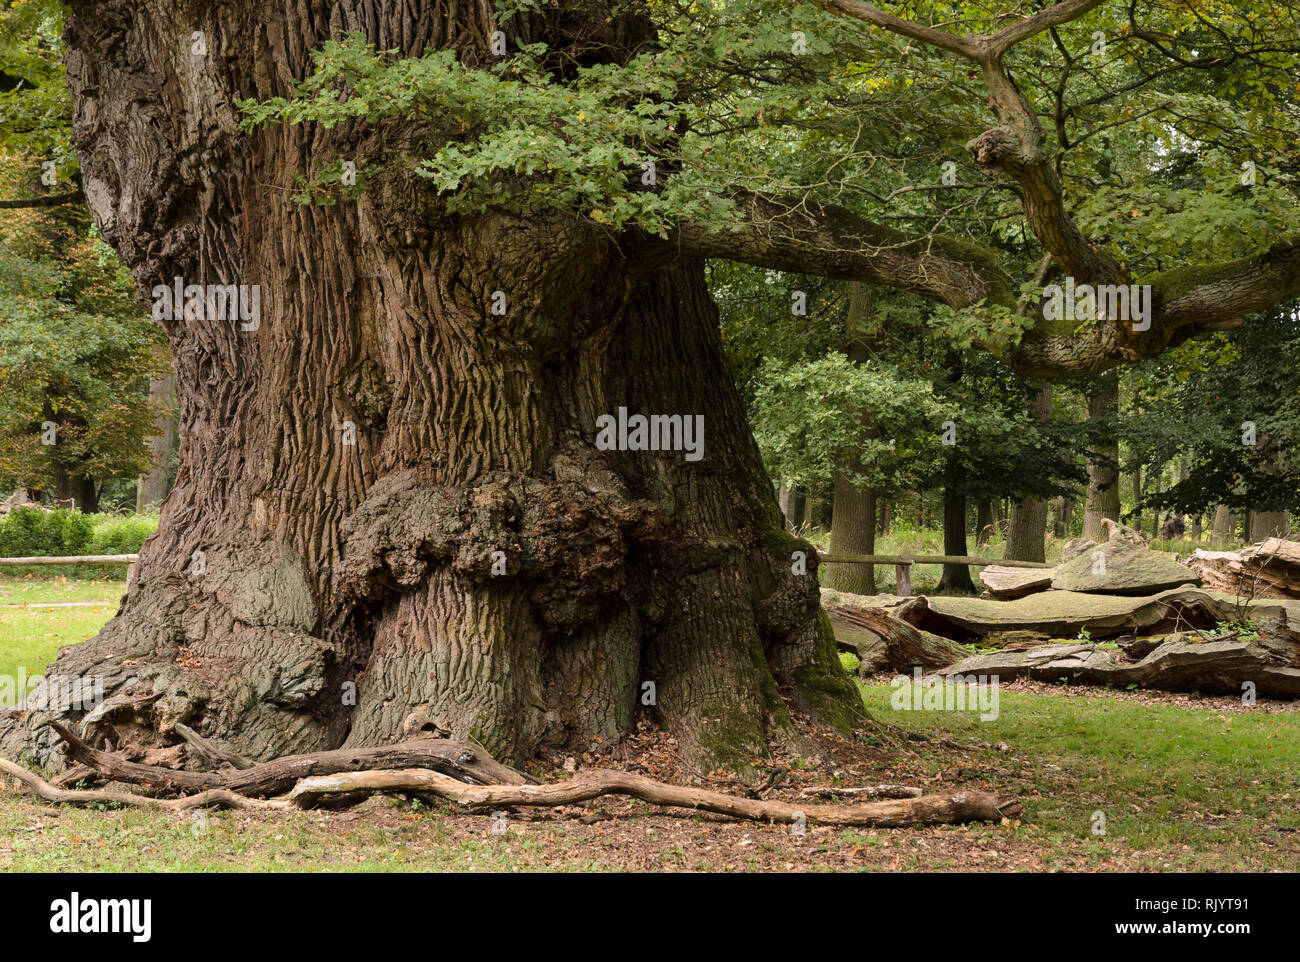 Oaktrees at Ivenack 'Ivenacker Eichen' Mecklenburg-Pomerania, Germany - Stock Image